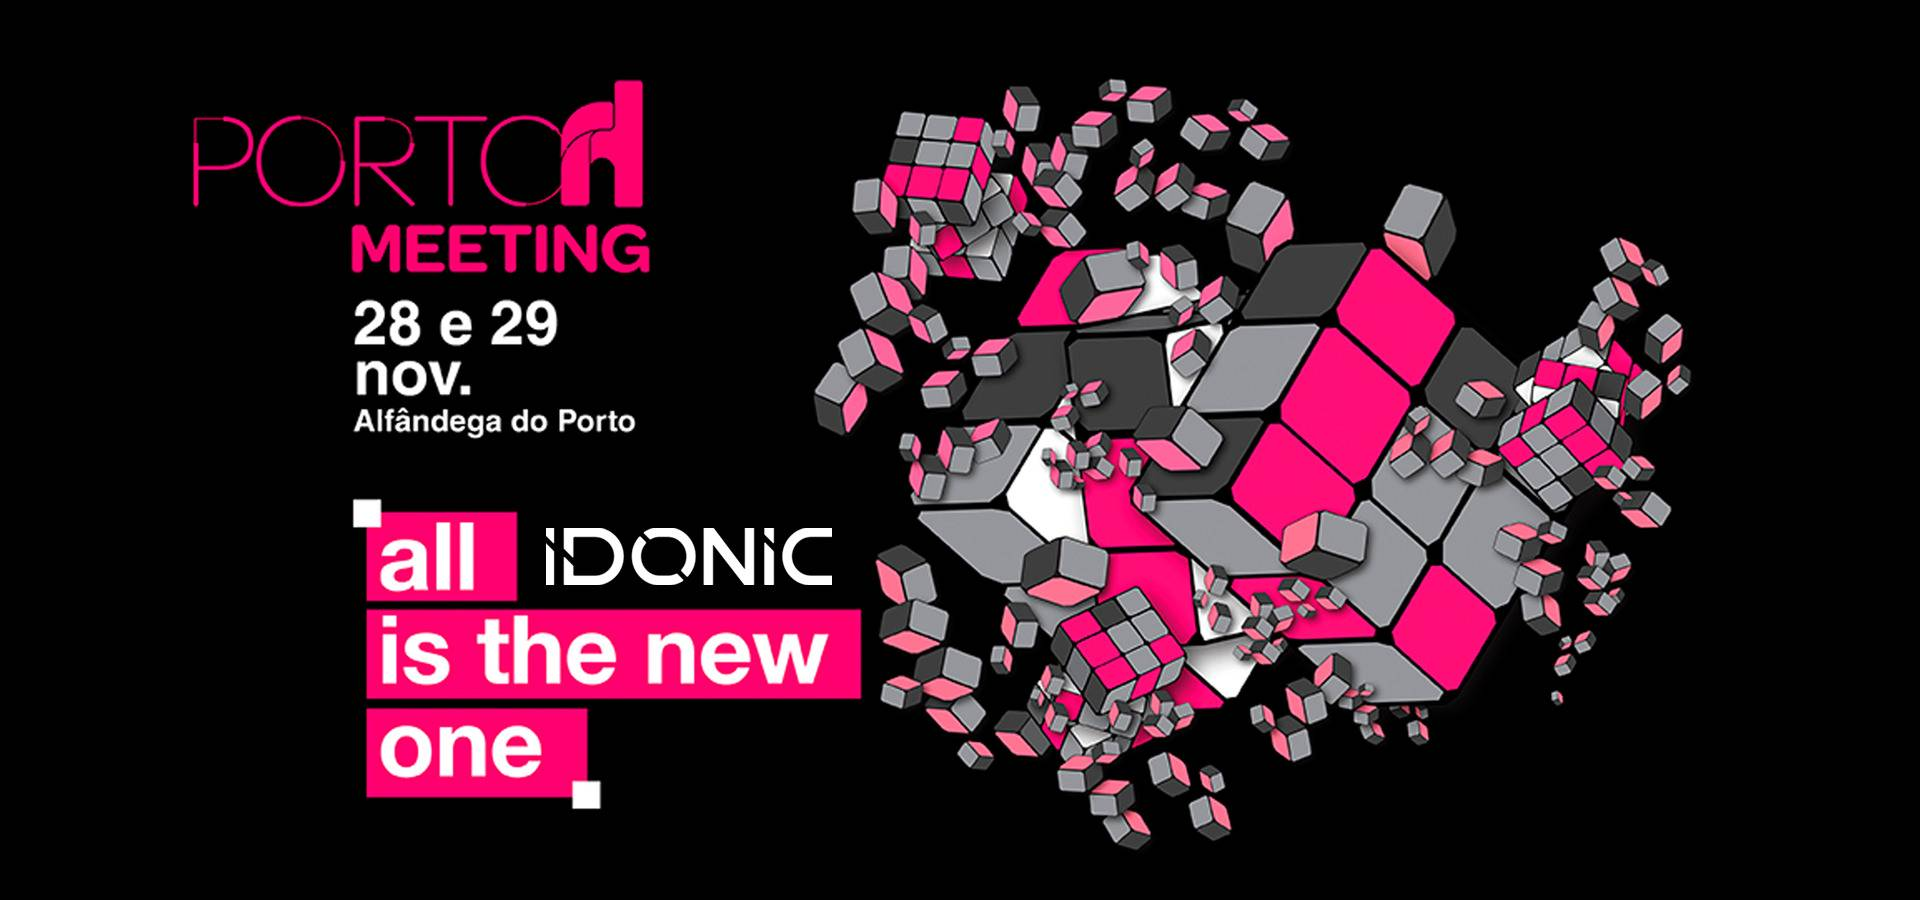 porto-rh-2018-idonic, porto rh meeting, porto rh, rh meeting